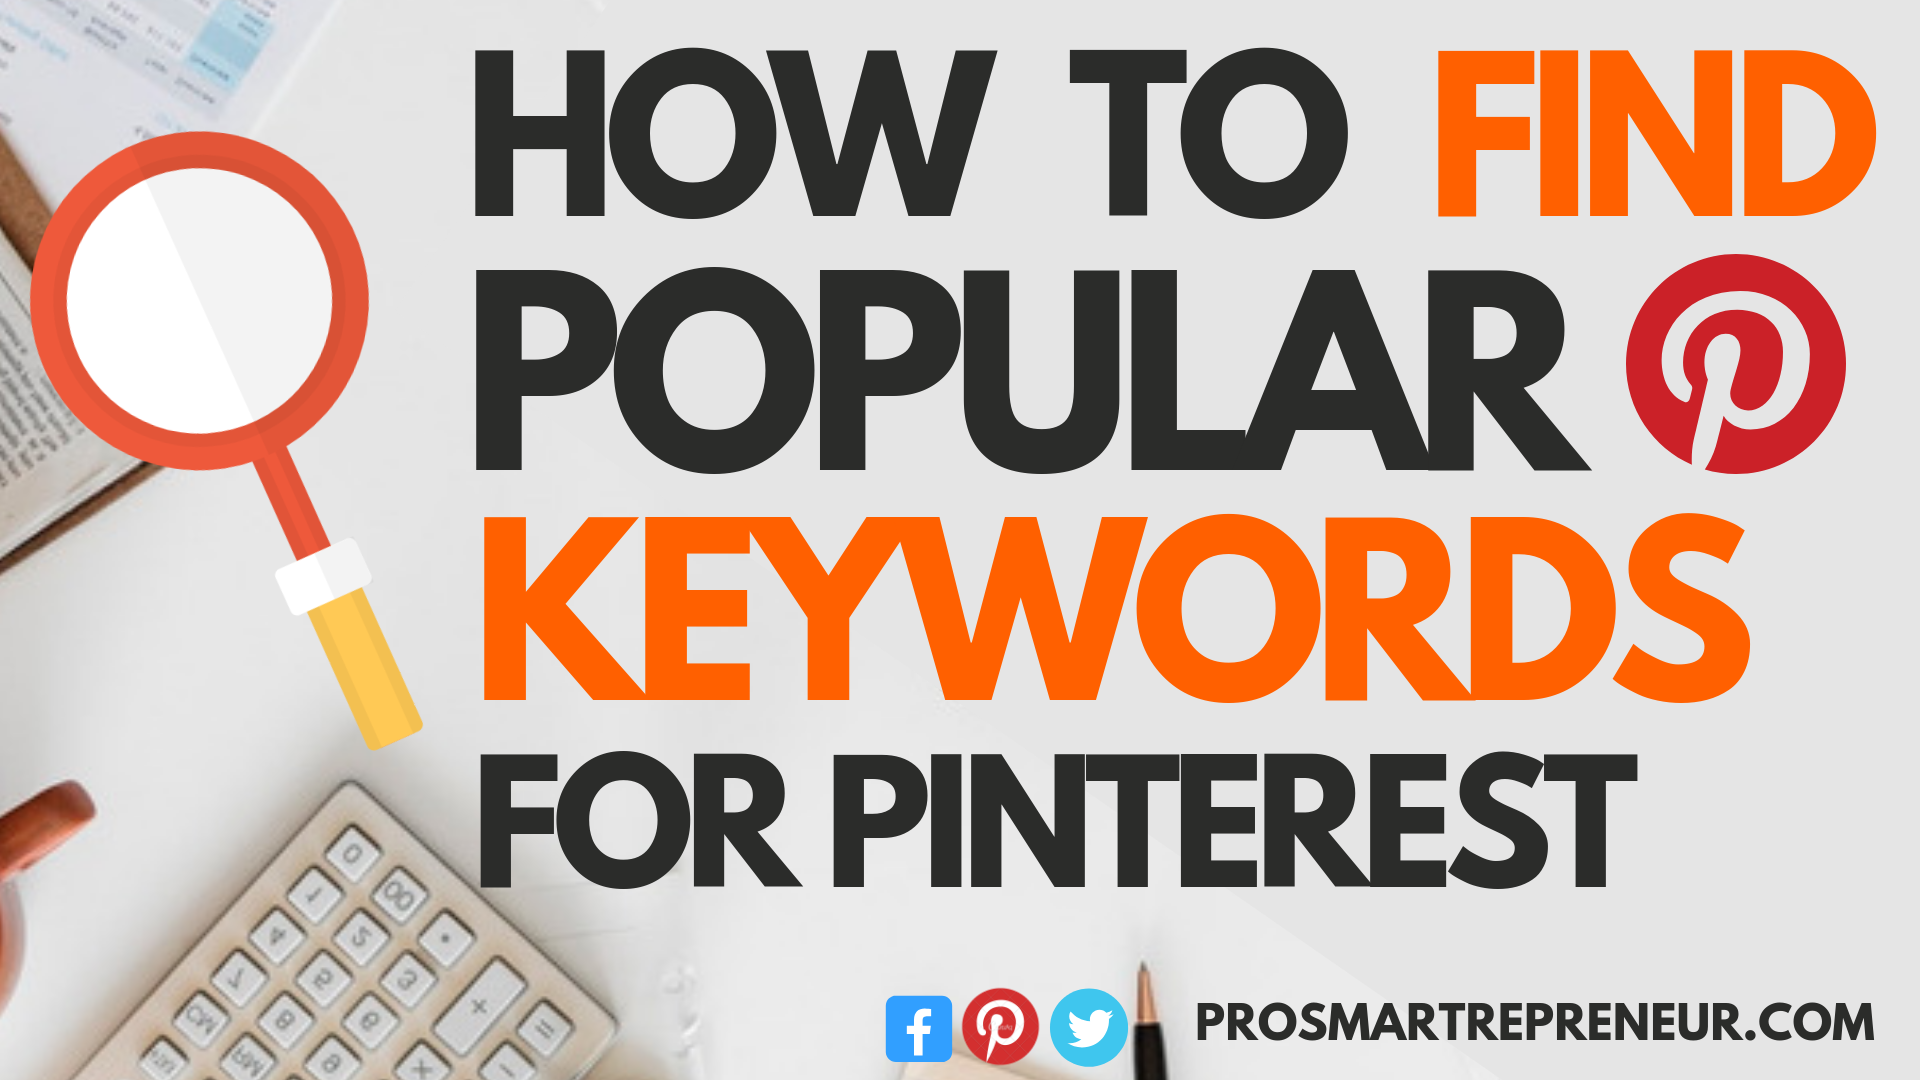 Keyword Planner - How To Find Keyword For Pinterest